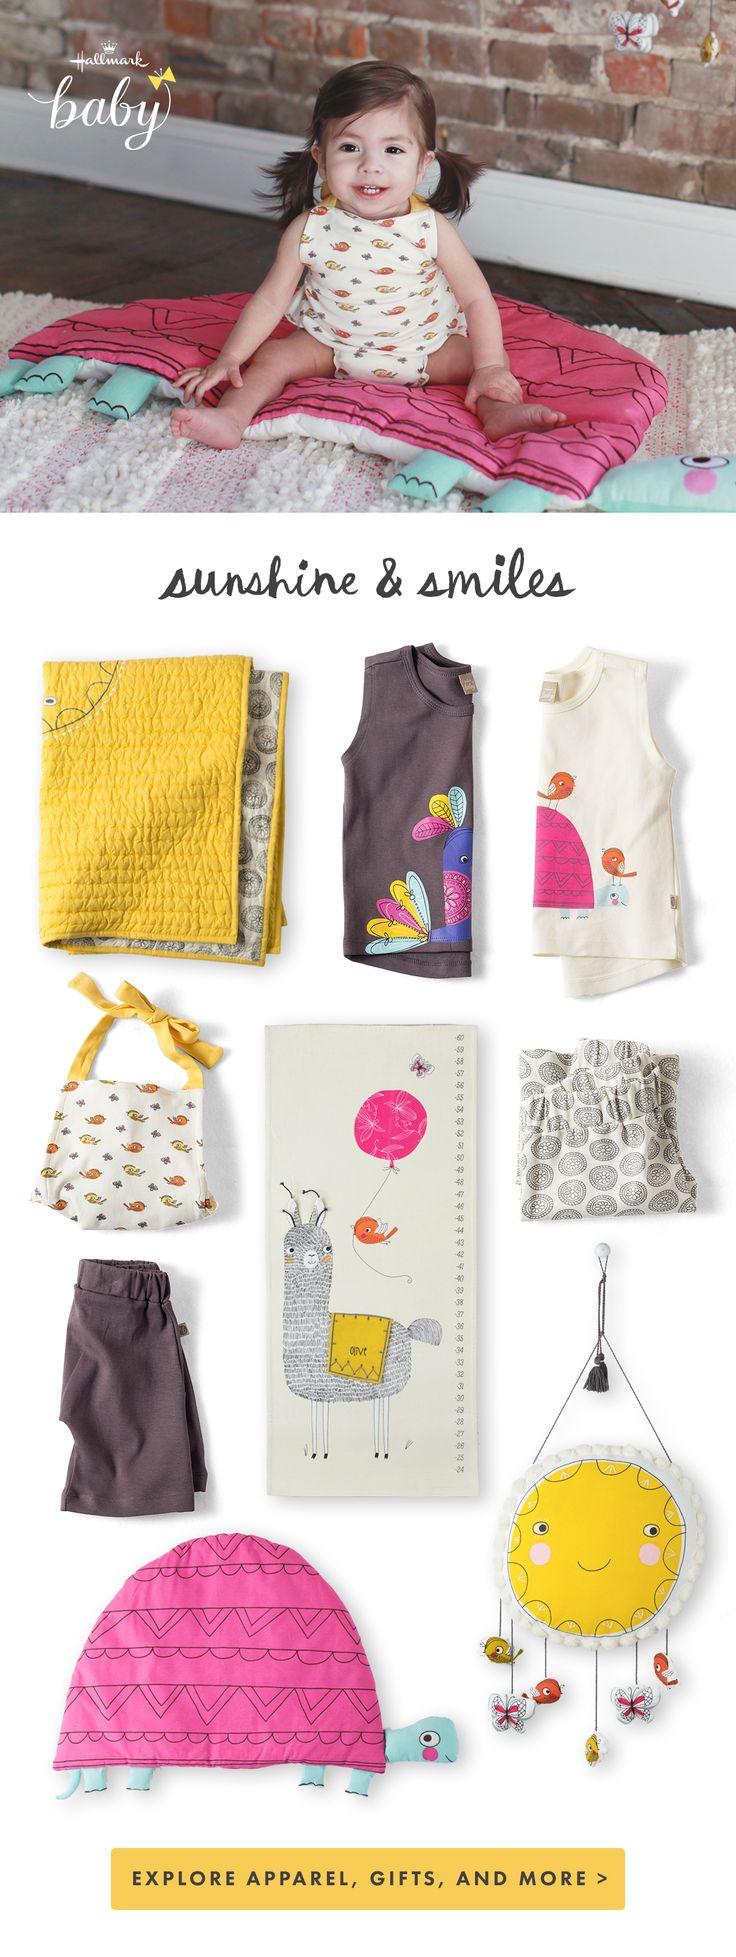 Bright & Sunny Baby Outfits & Nursery Decor - Explore Hallmark Baby's Sunny Day Collection!